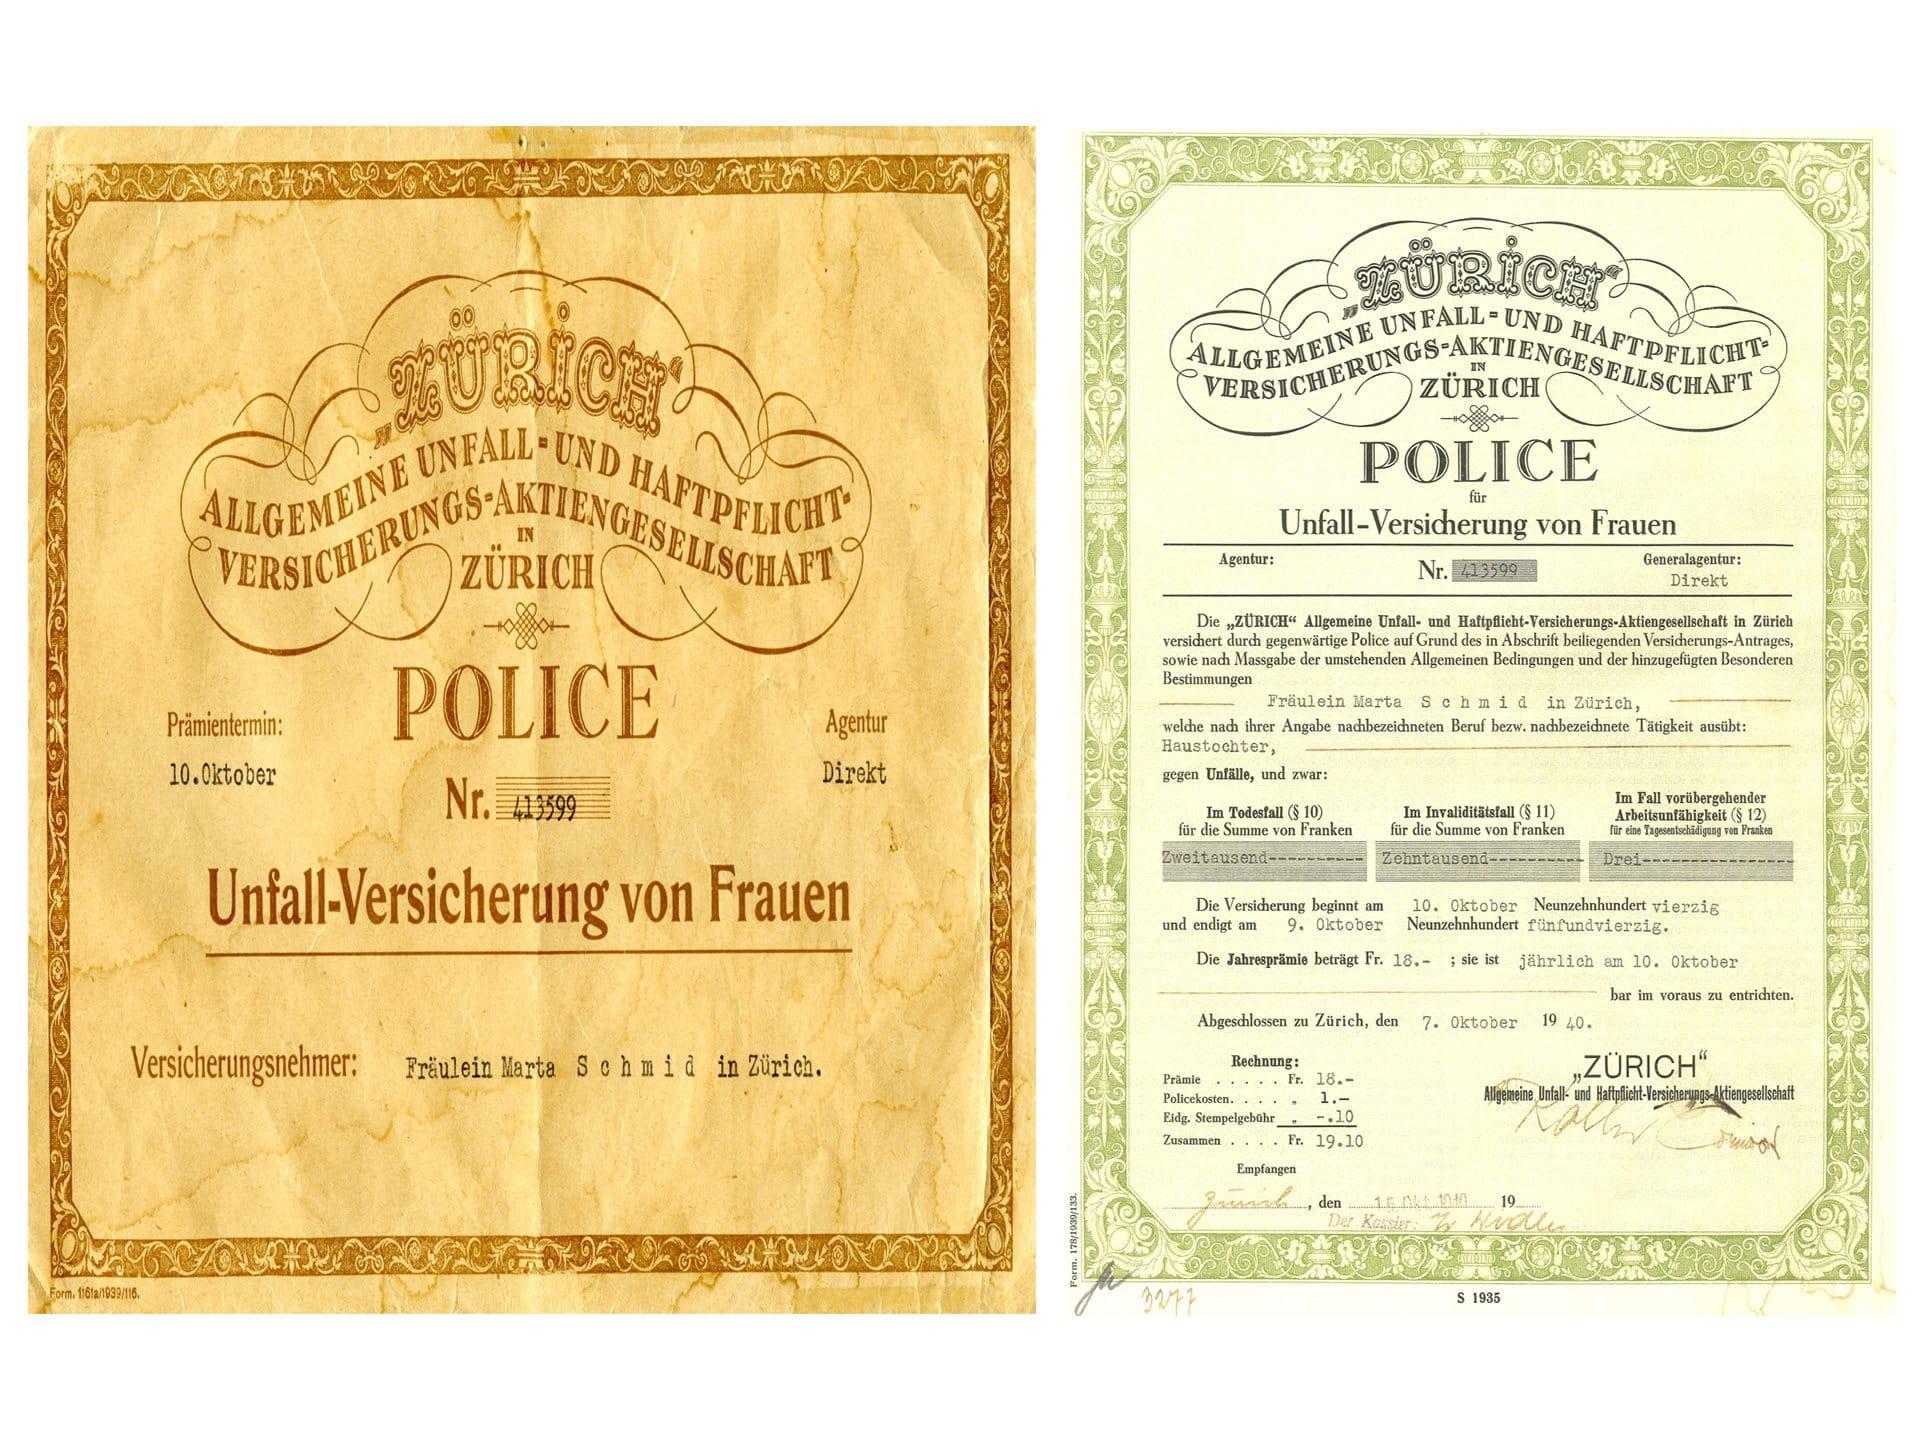 1935: Frauen-Unfall-Versicherung